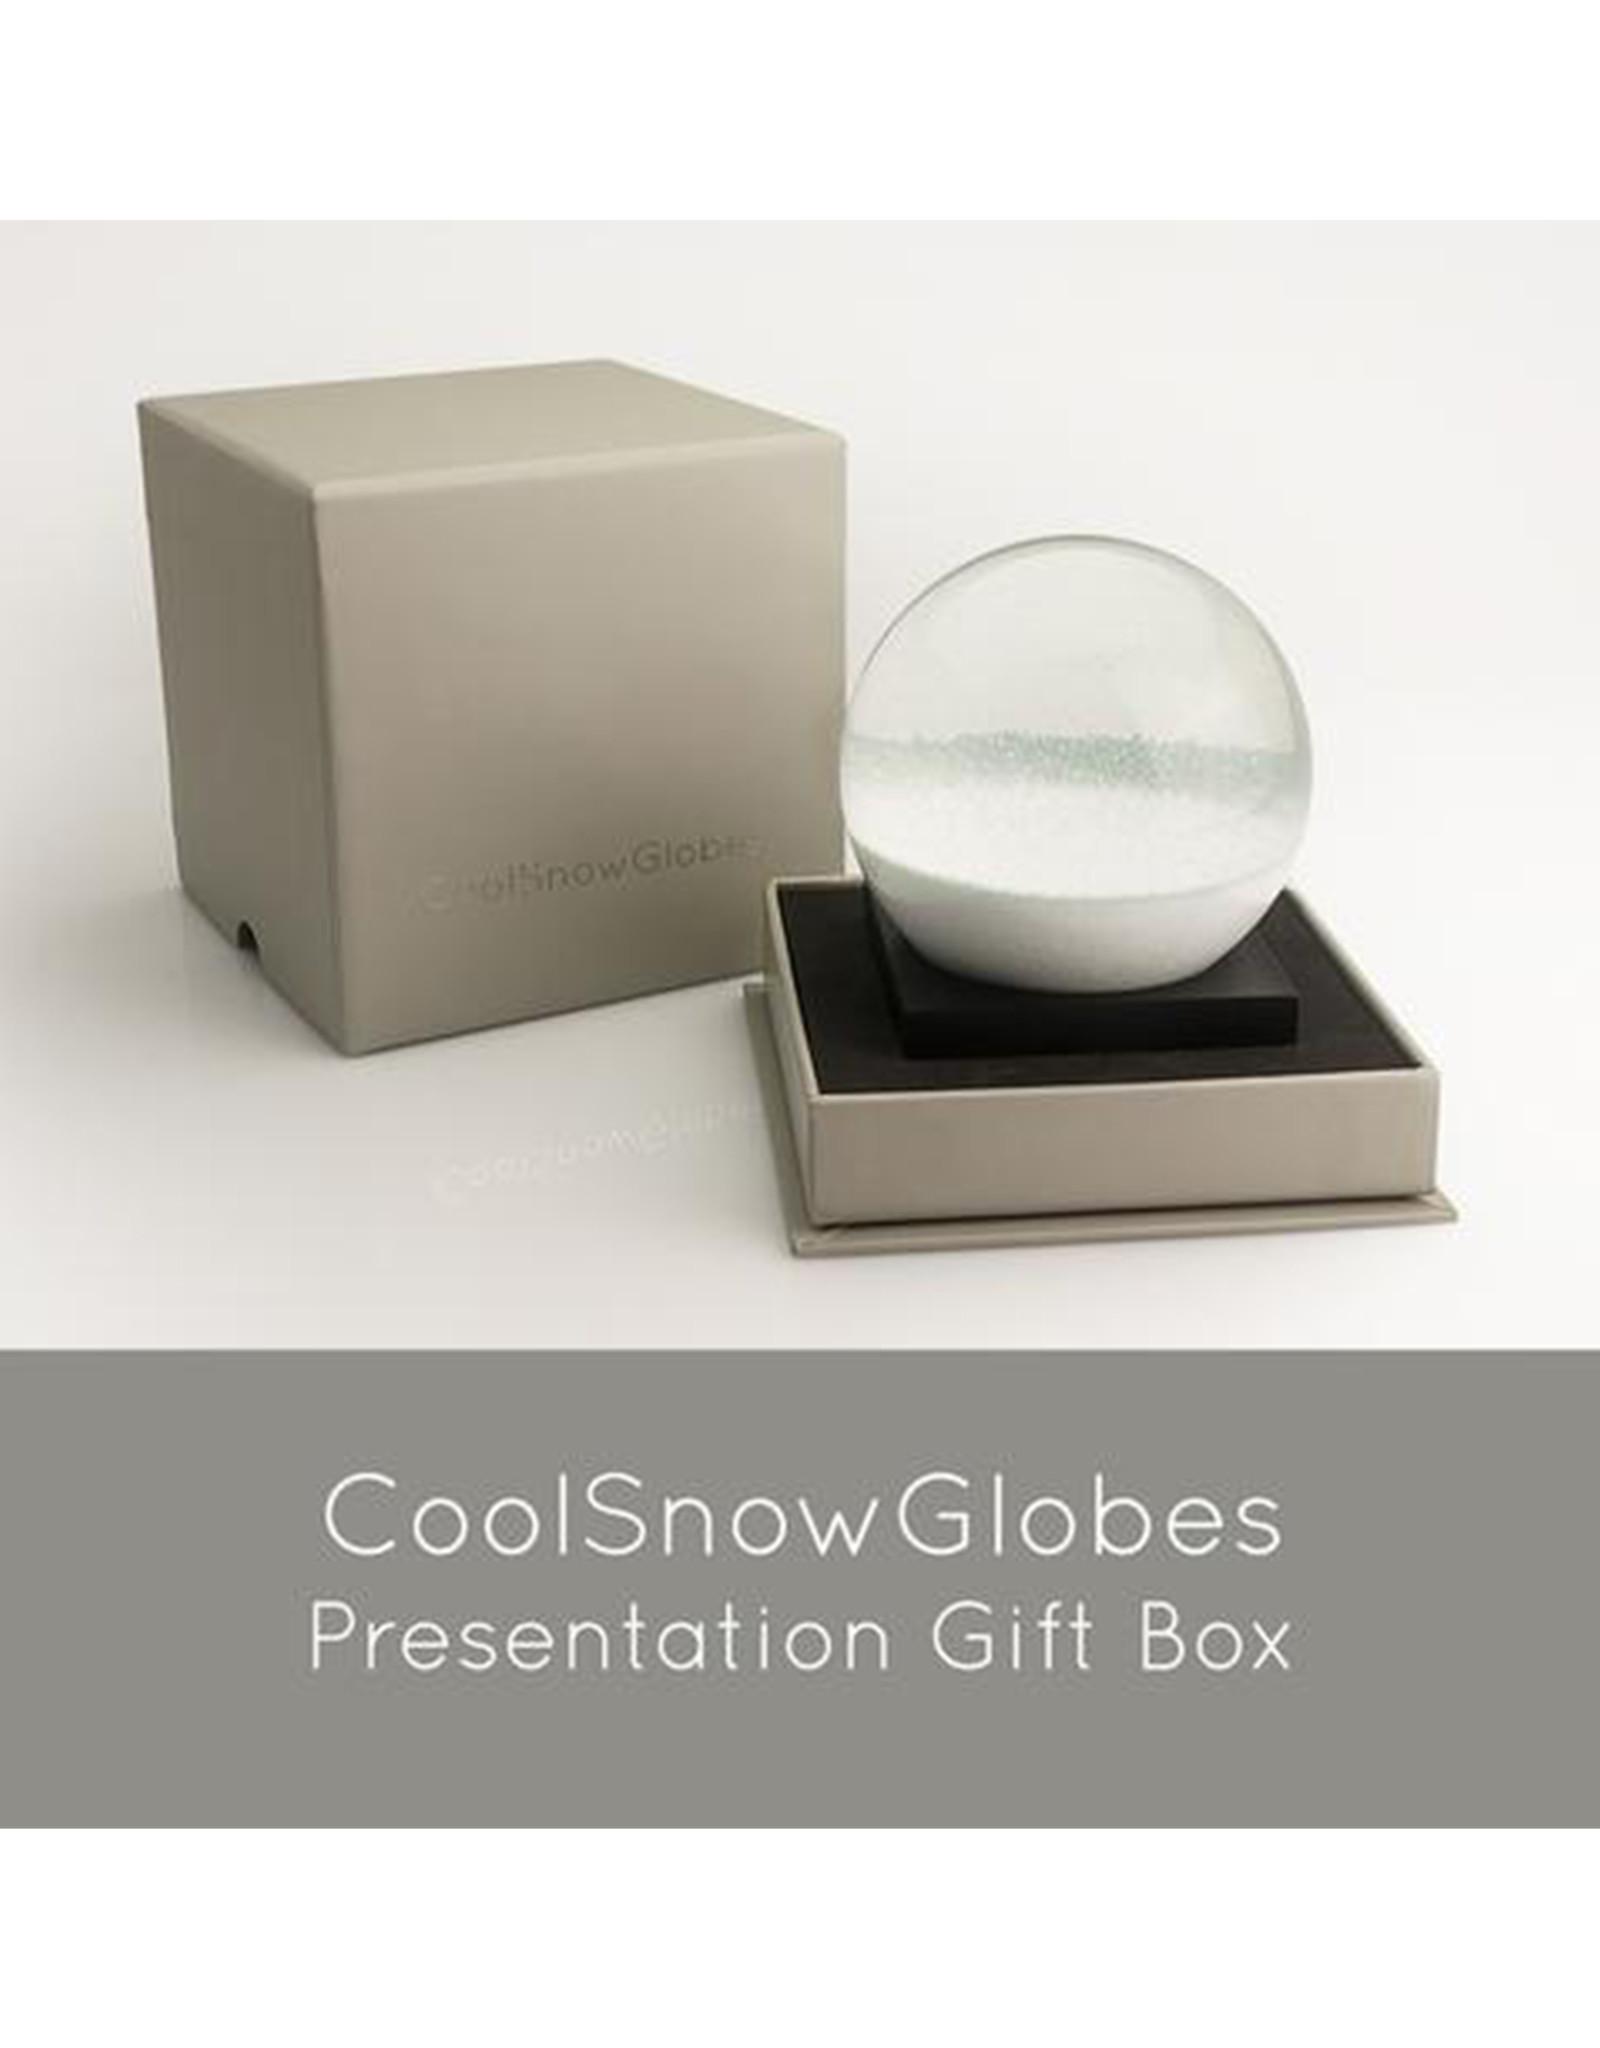 COOL SNOW GLOBES GOLD BUDDHA SNOW GLOBE